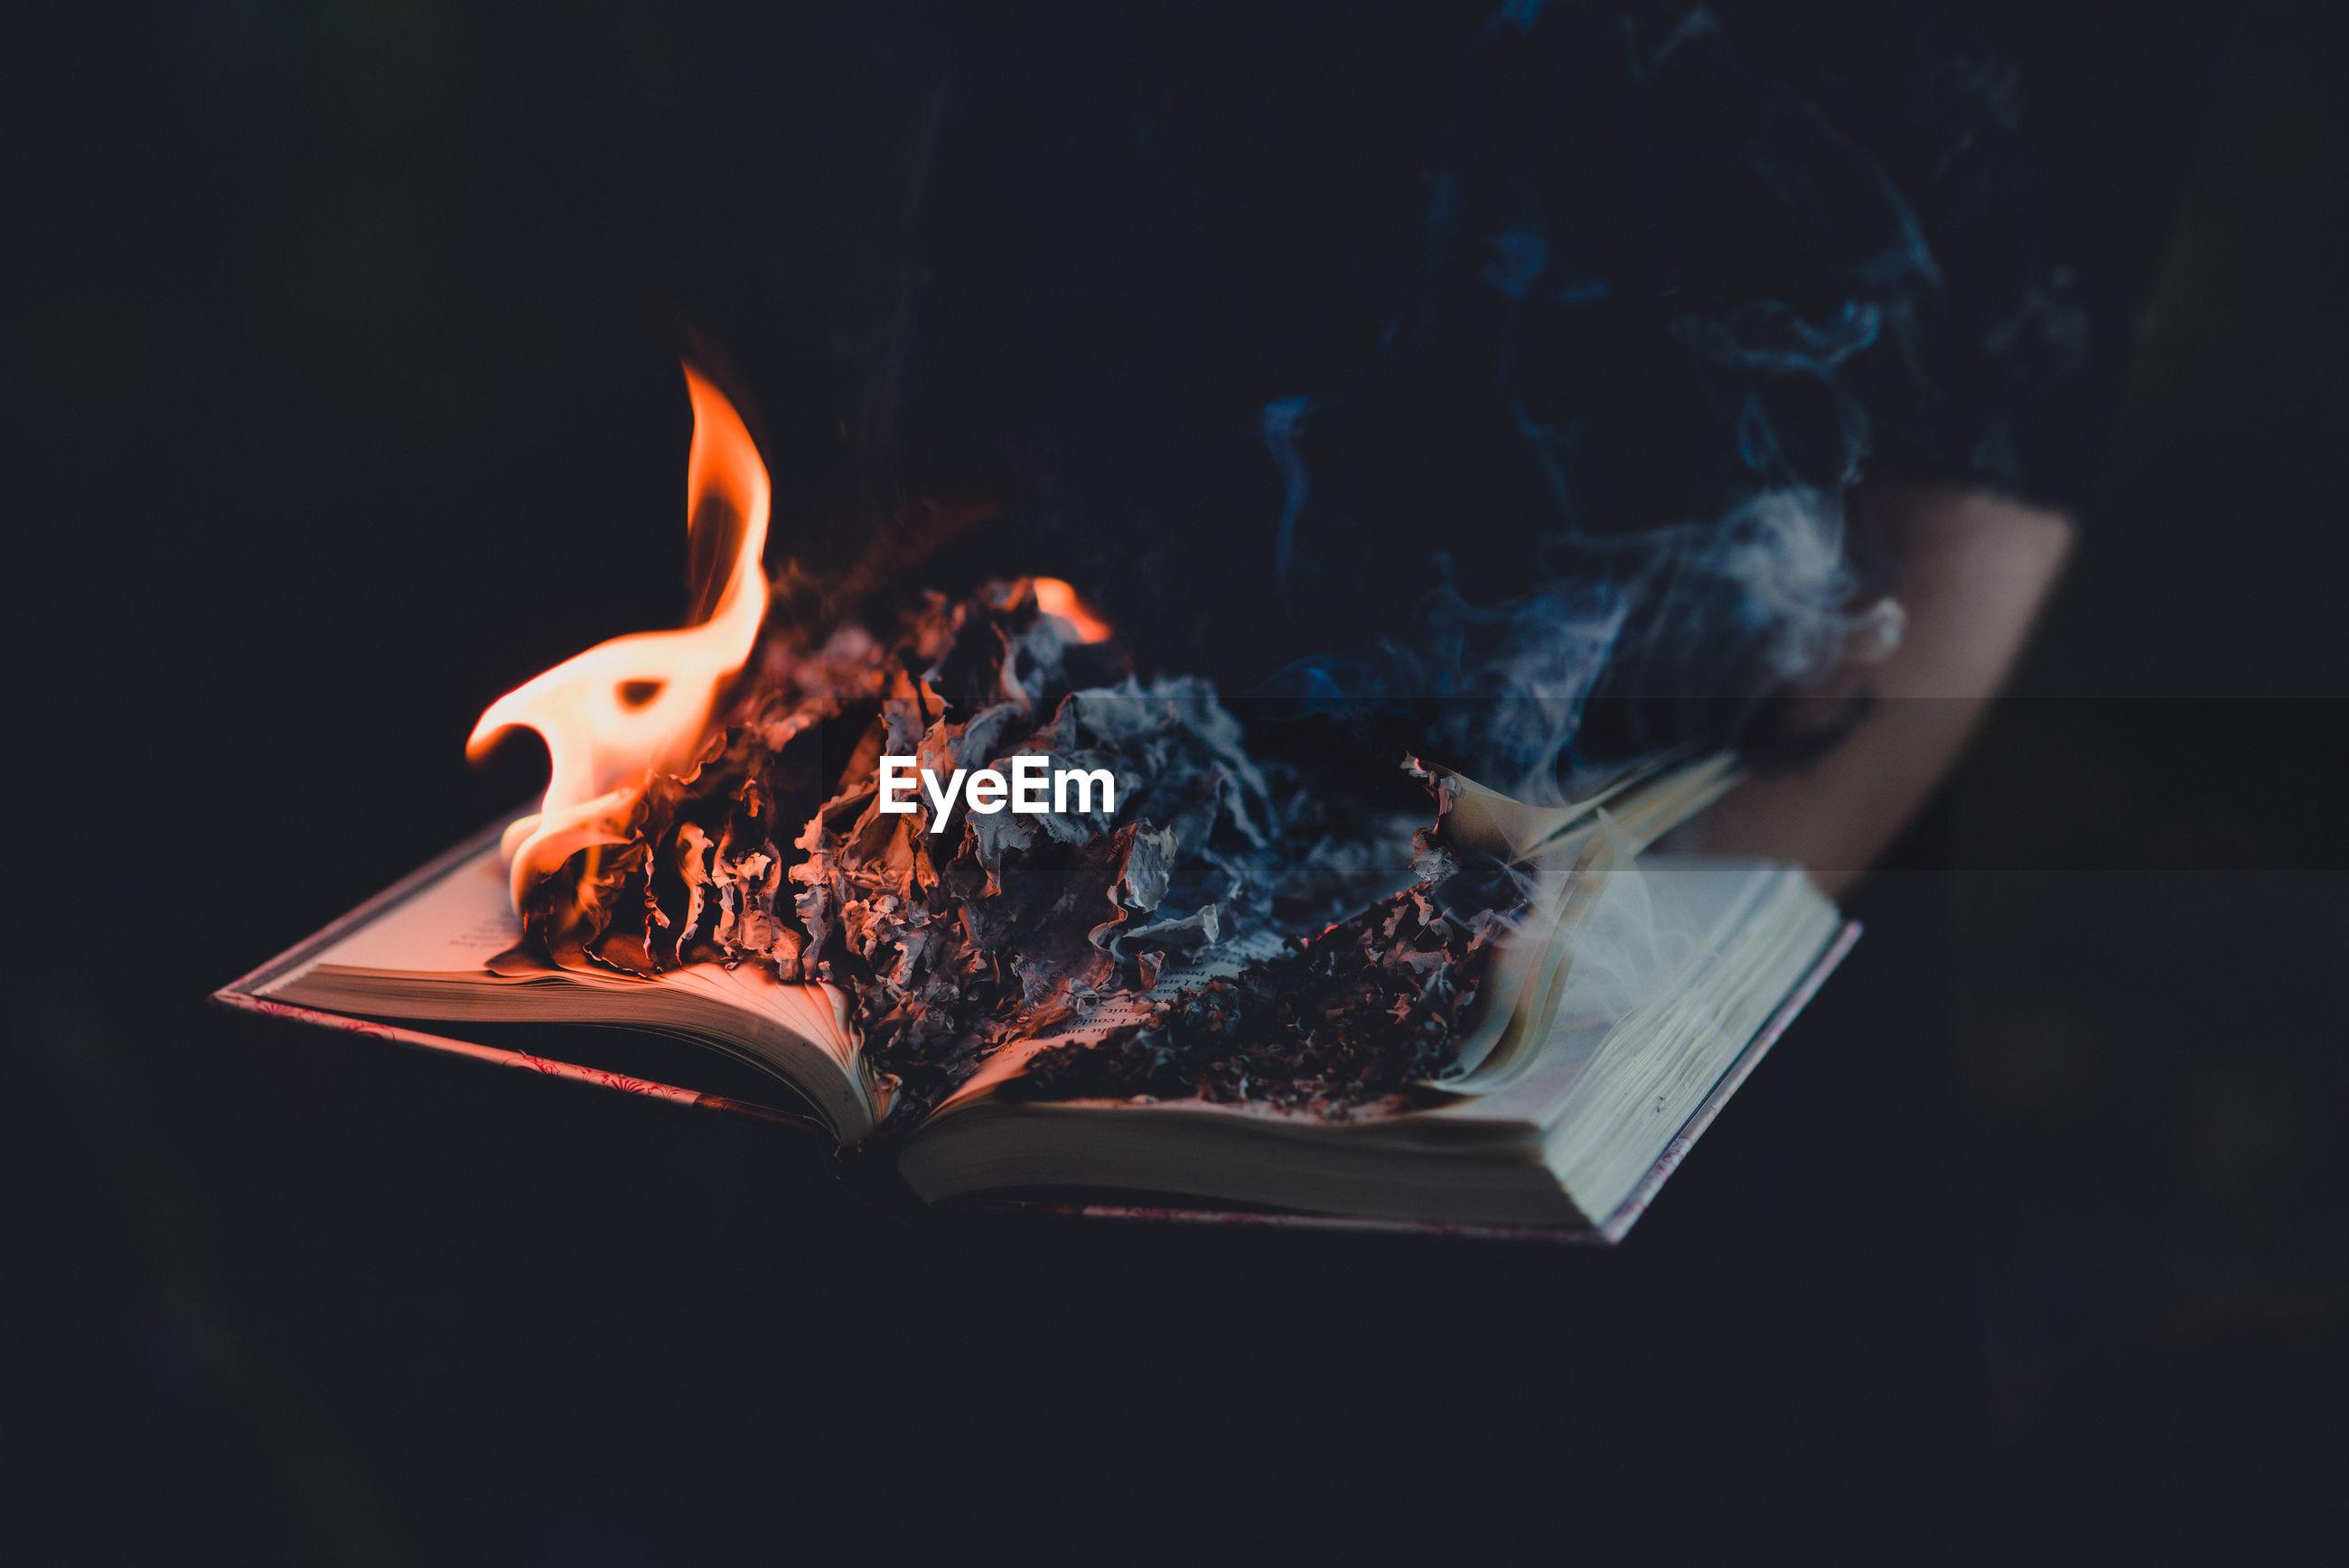 Burning book against black background